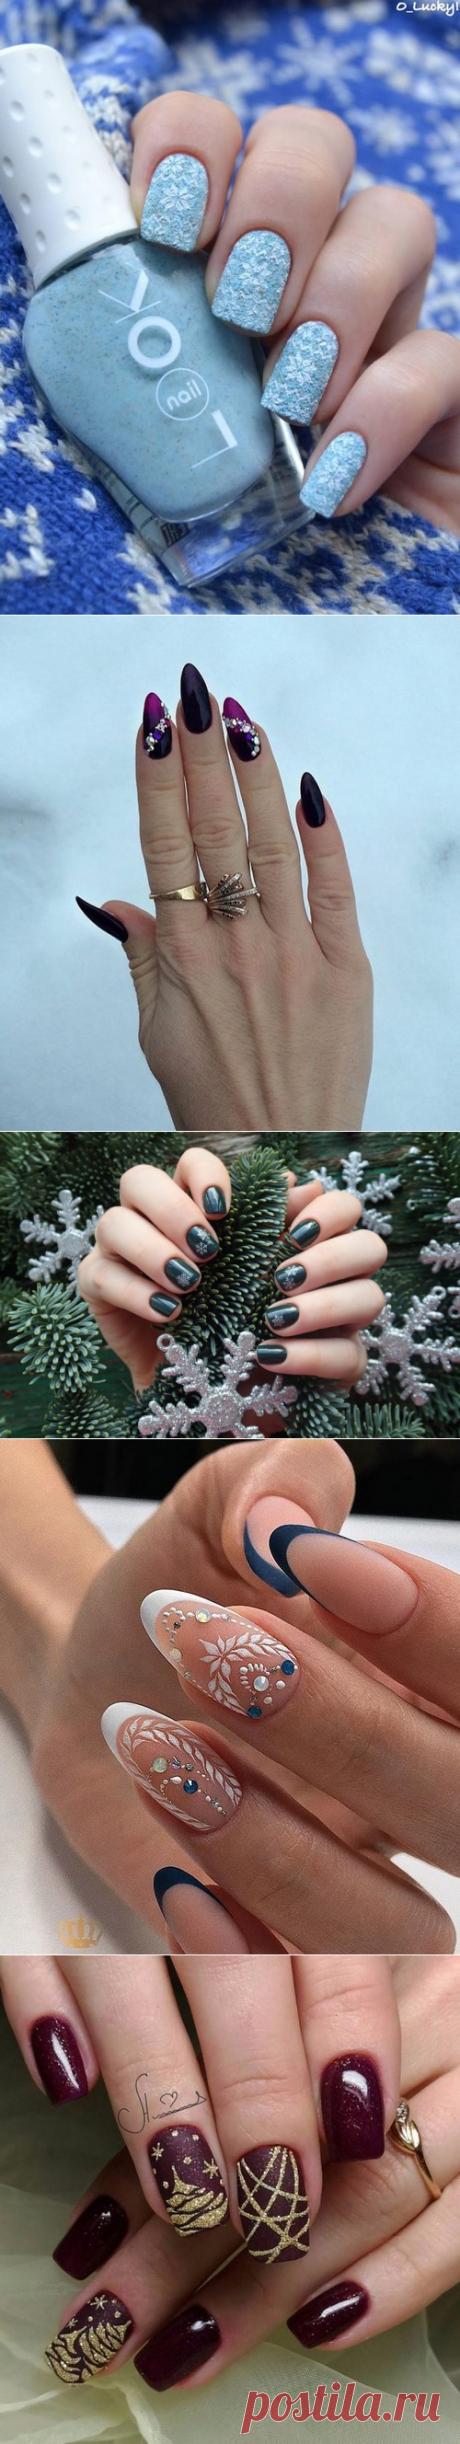 TOP of IDEAS: winter manicure 2019, fashionable manicure winter, winter design of nails - a photo | topidej.ru